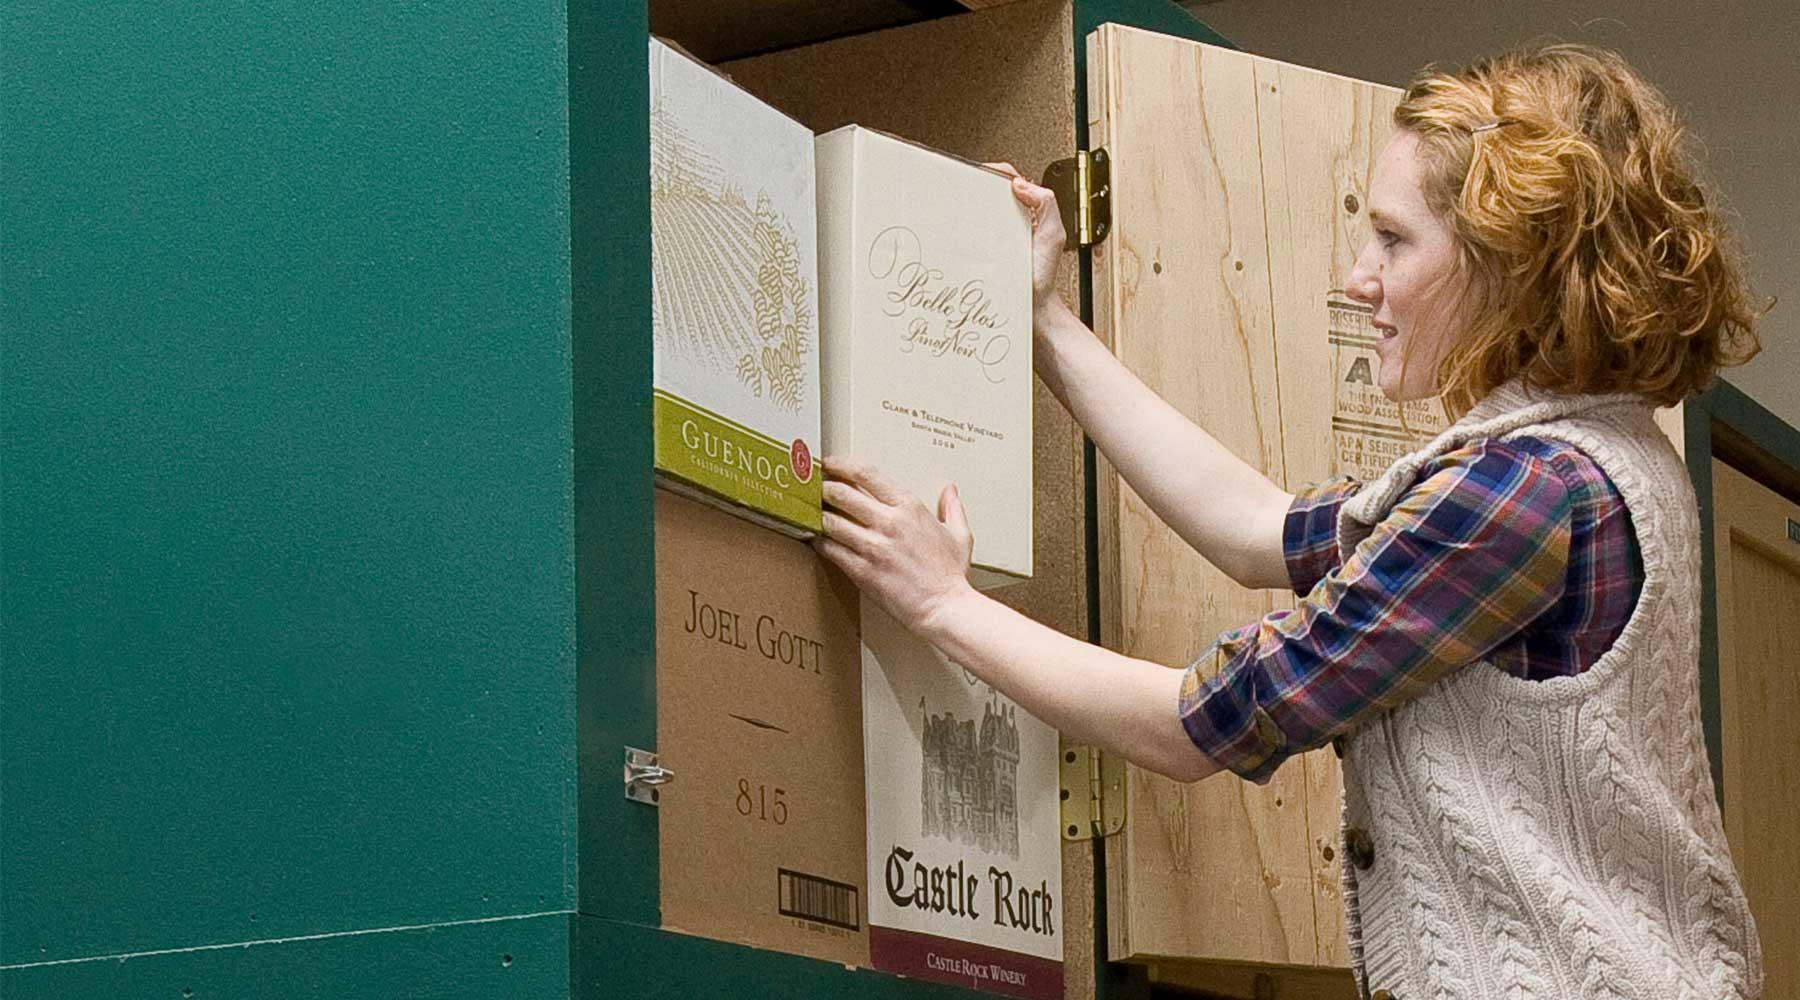 Napa storage wine locker